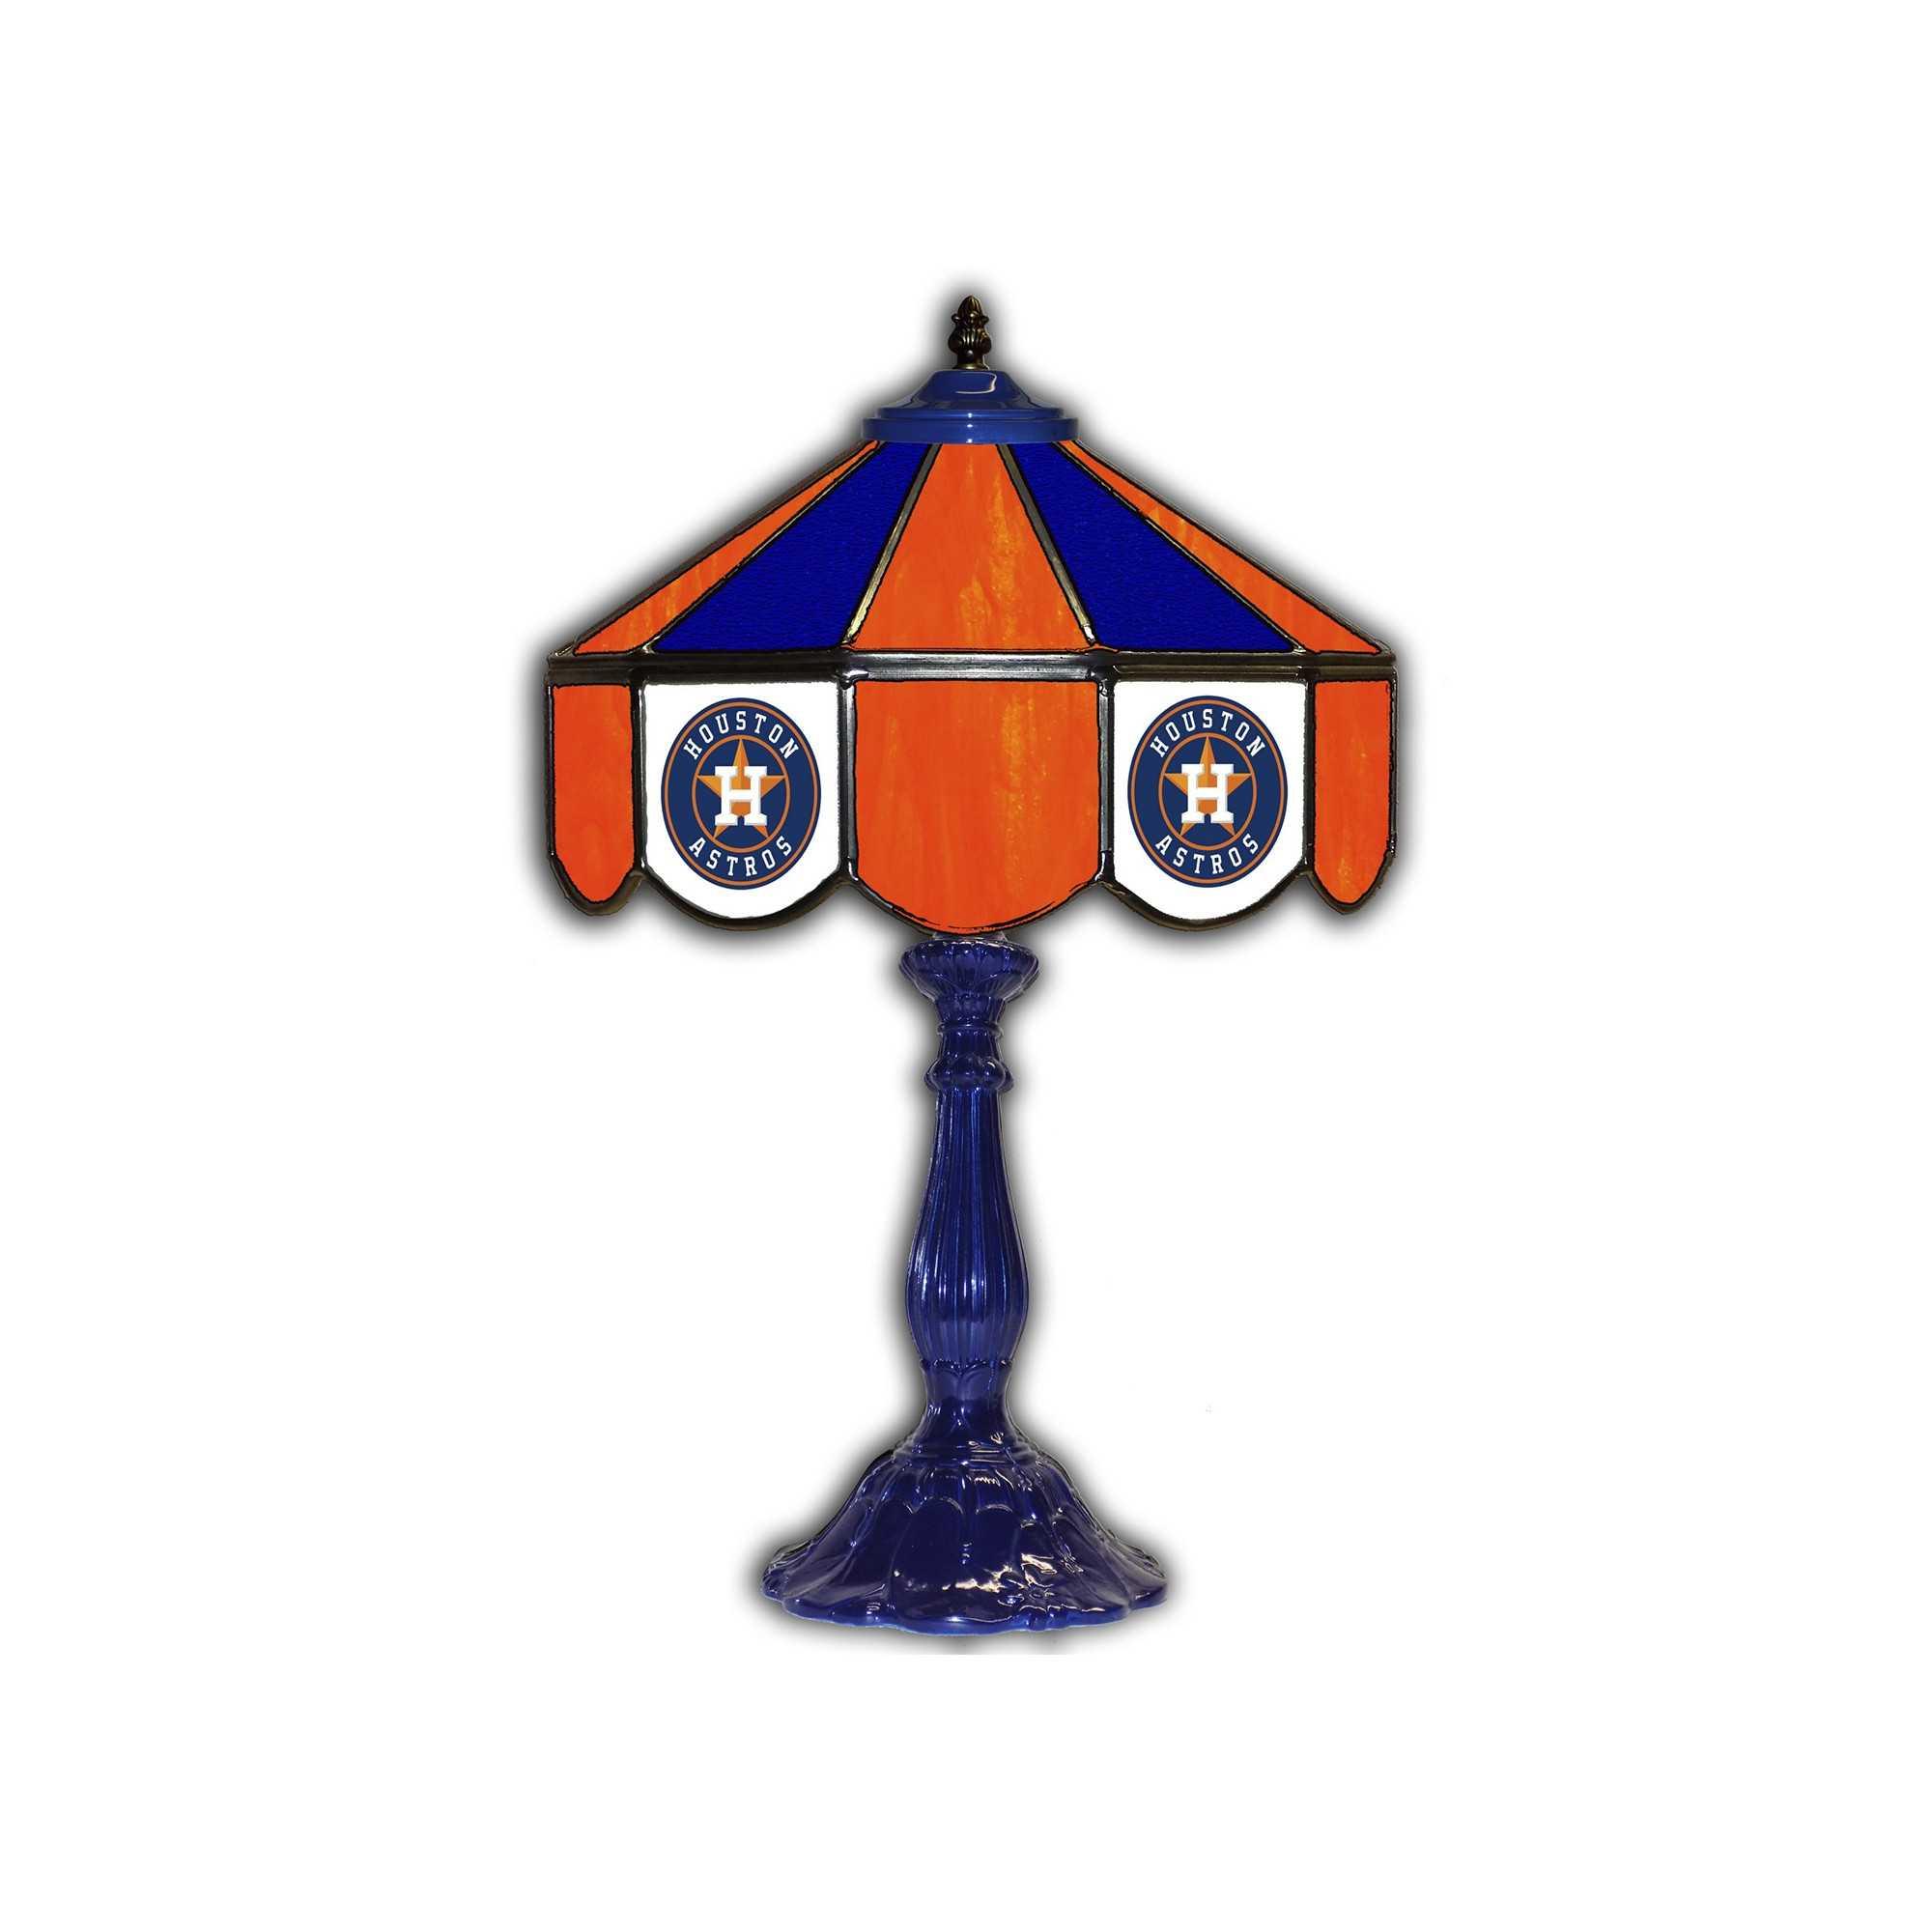 "HOUSTON ASTROS 21"" GLASS TABLE LAMP"